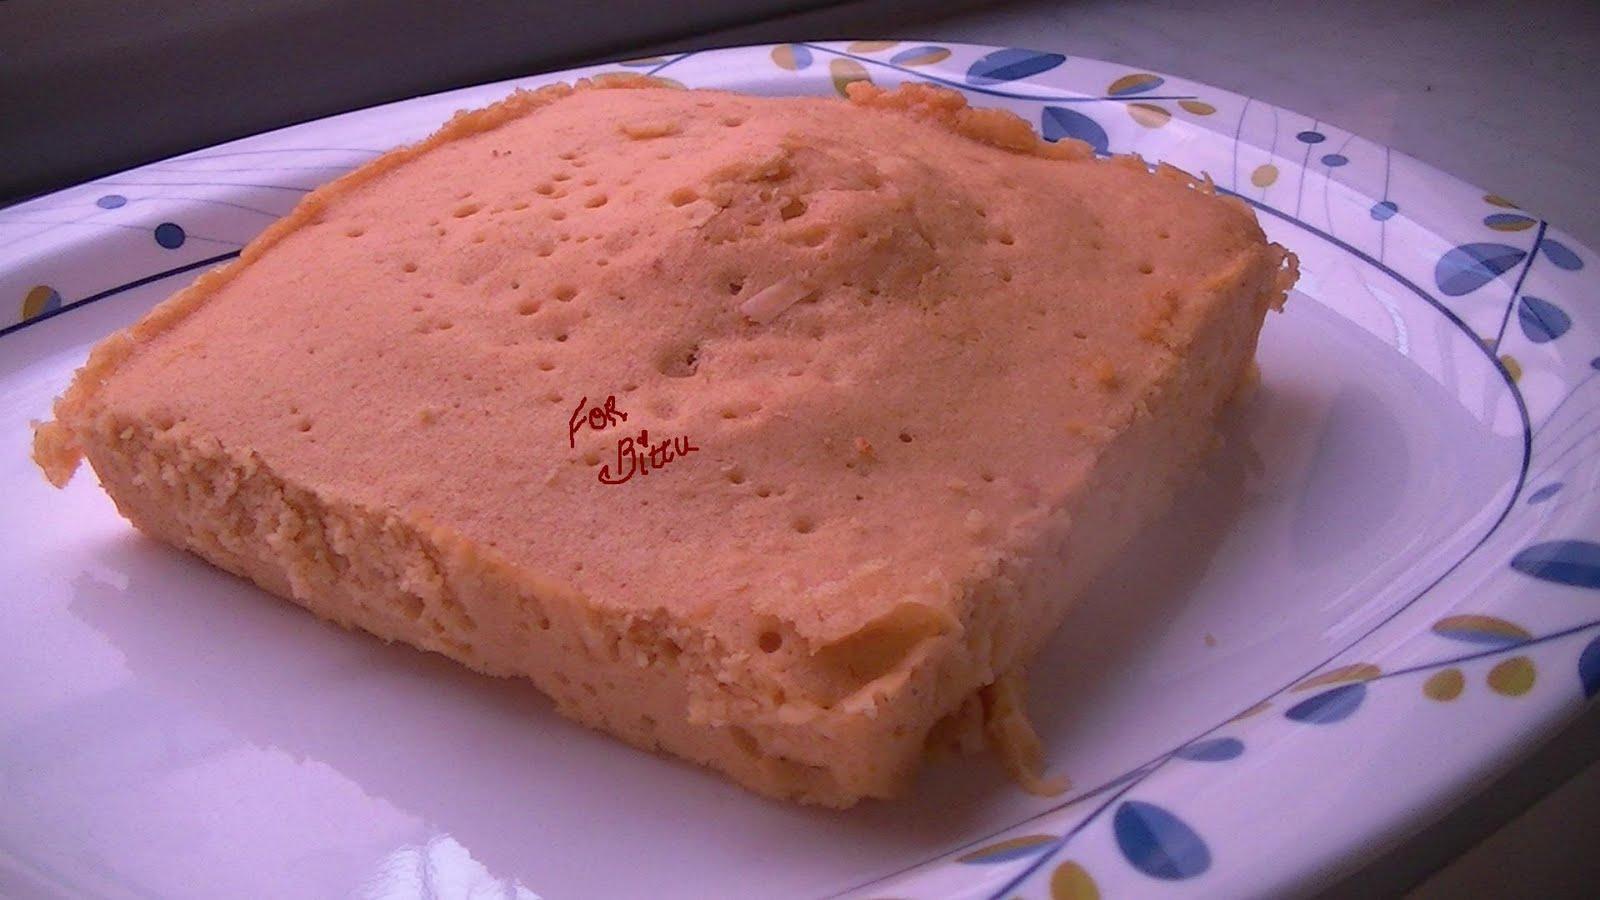 Microwave Cake Recipes Lemon: Mittu Cooking Love: Orange Cake In A Microwave